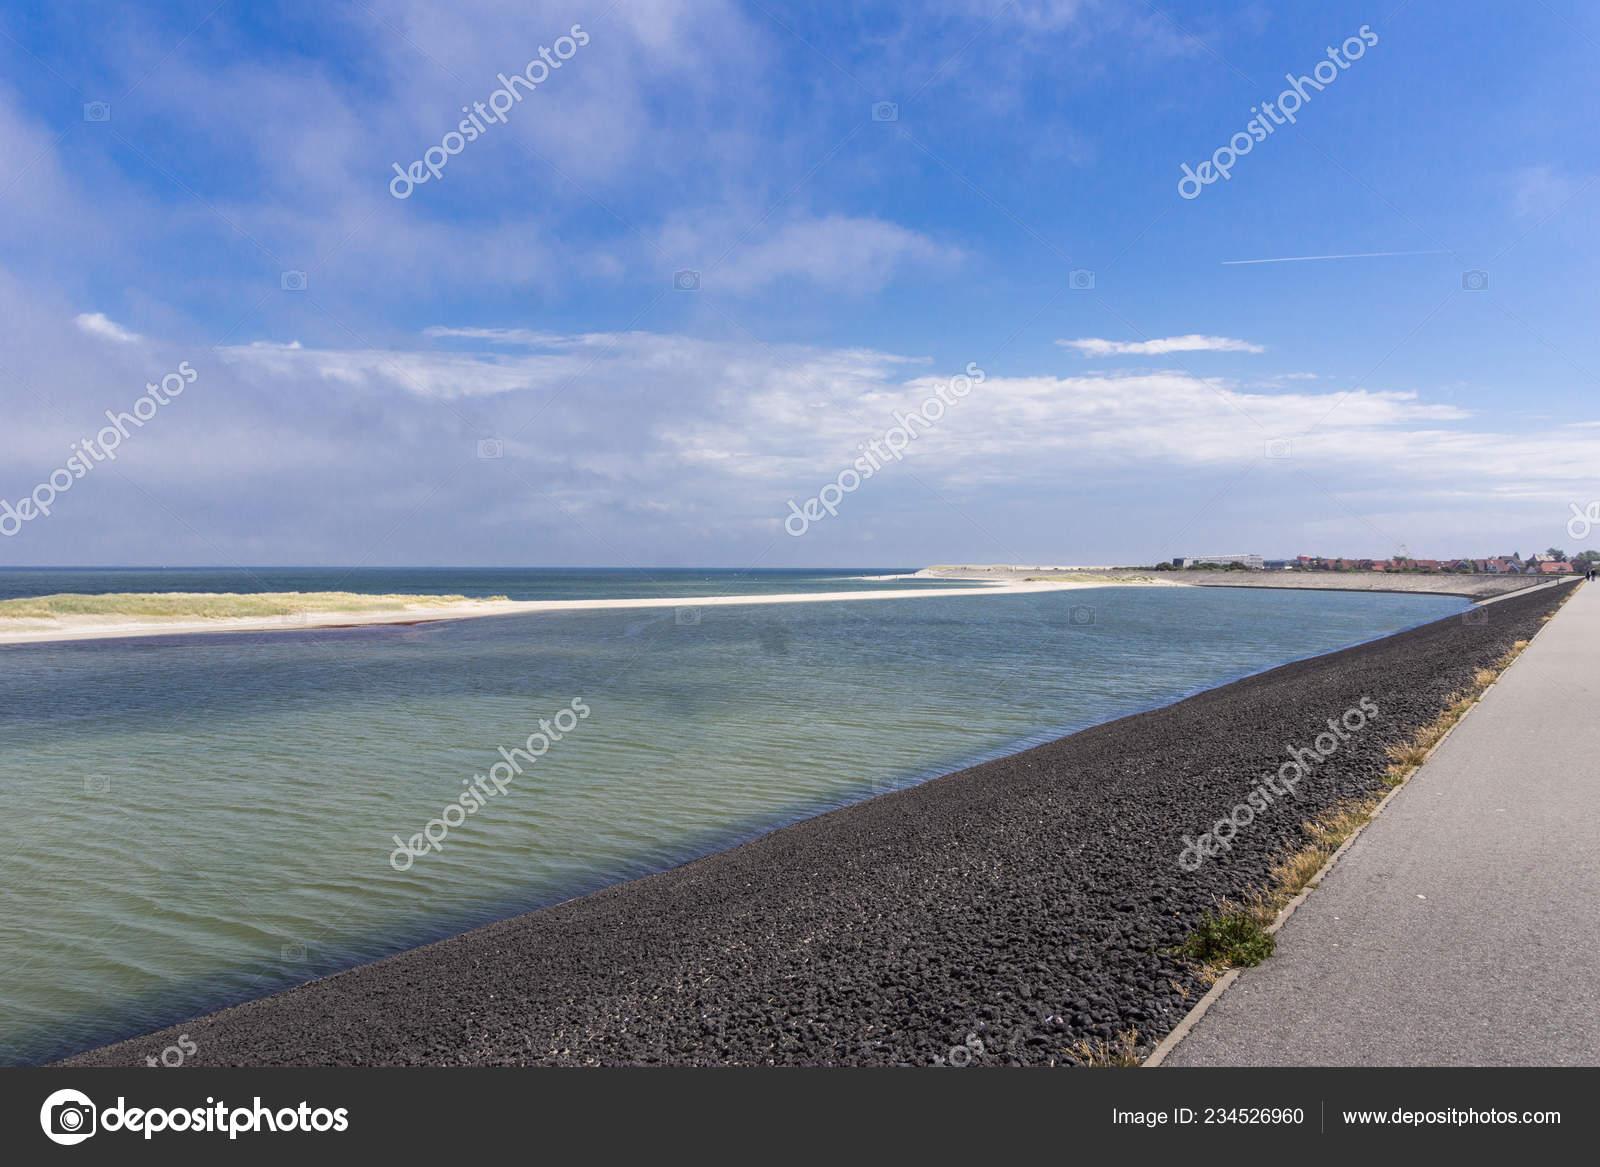 Sylt North Germany Island North Sea August 2018 Stock Photo